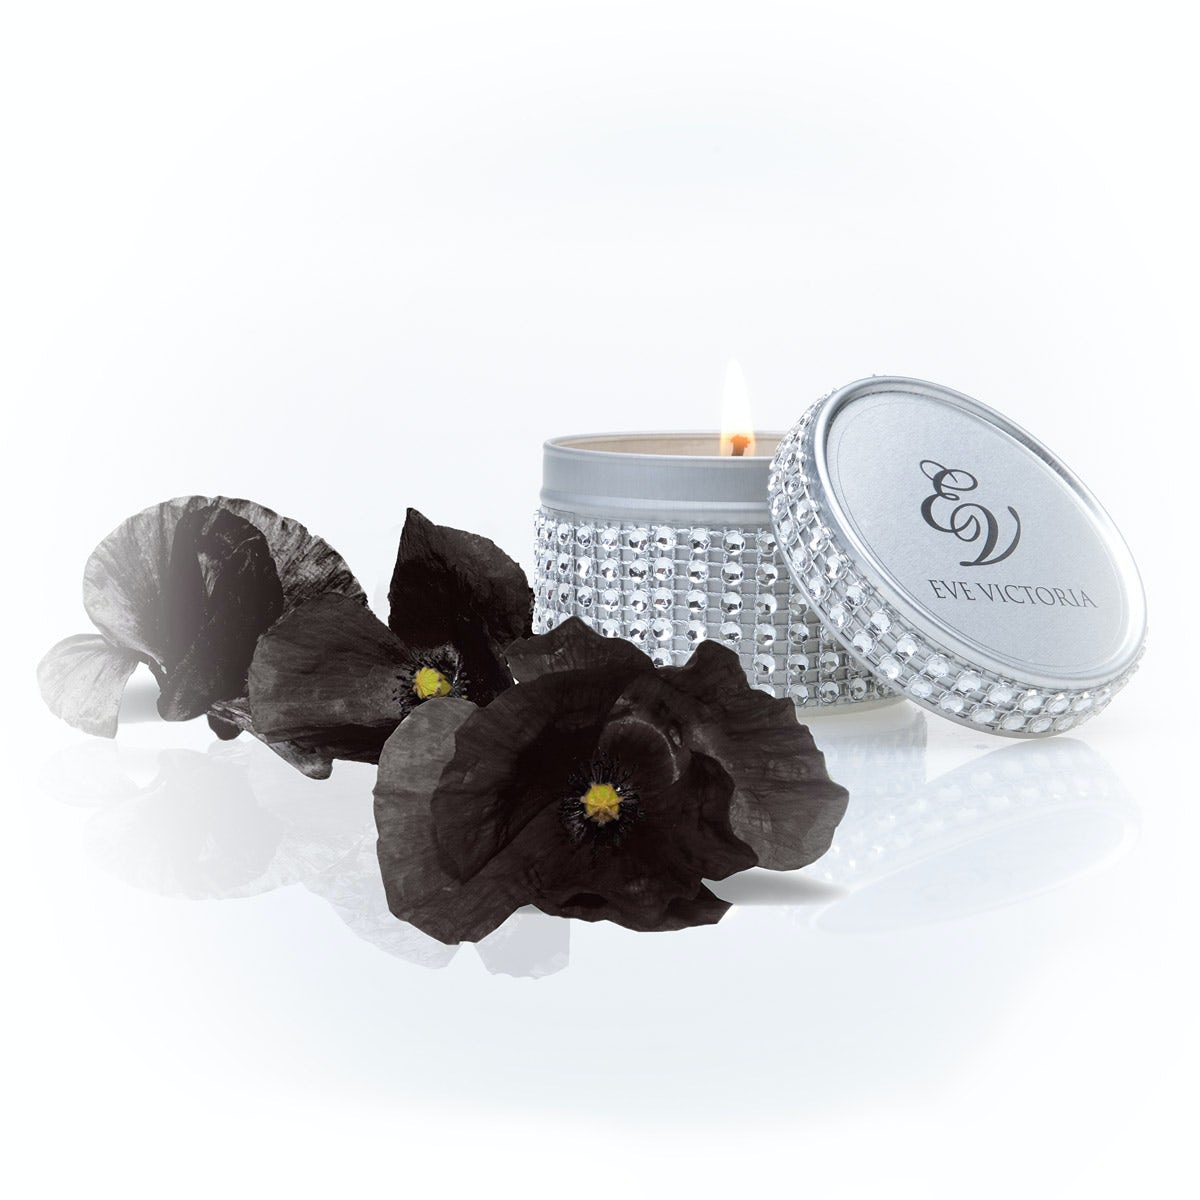 Eve Victoria Black poppy diamante tin